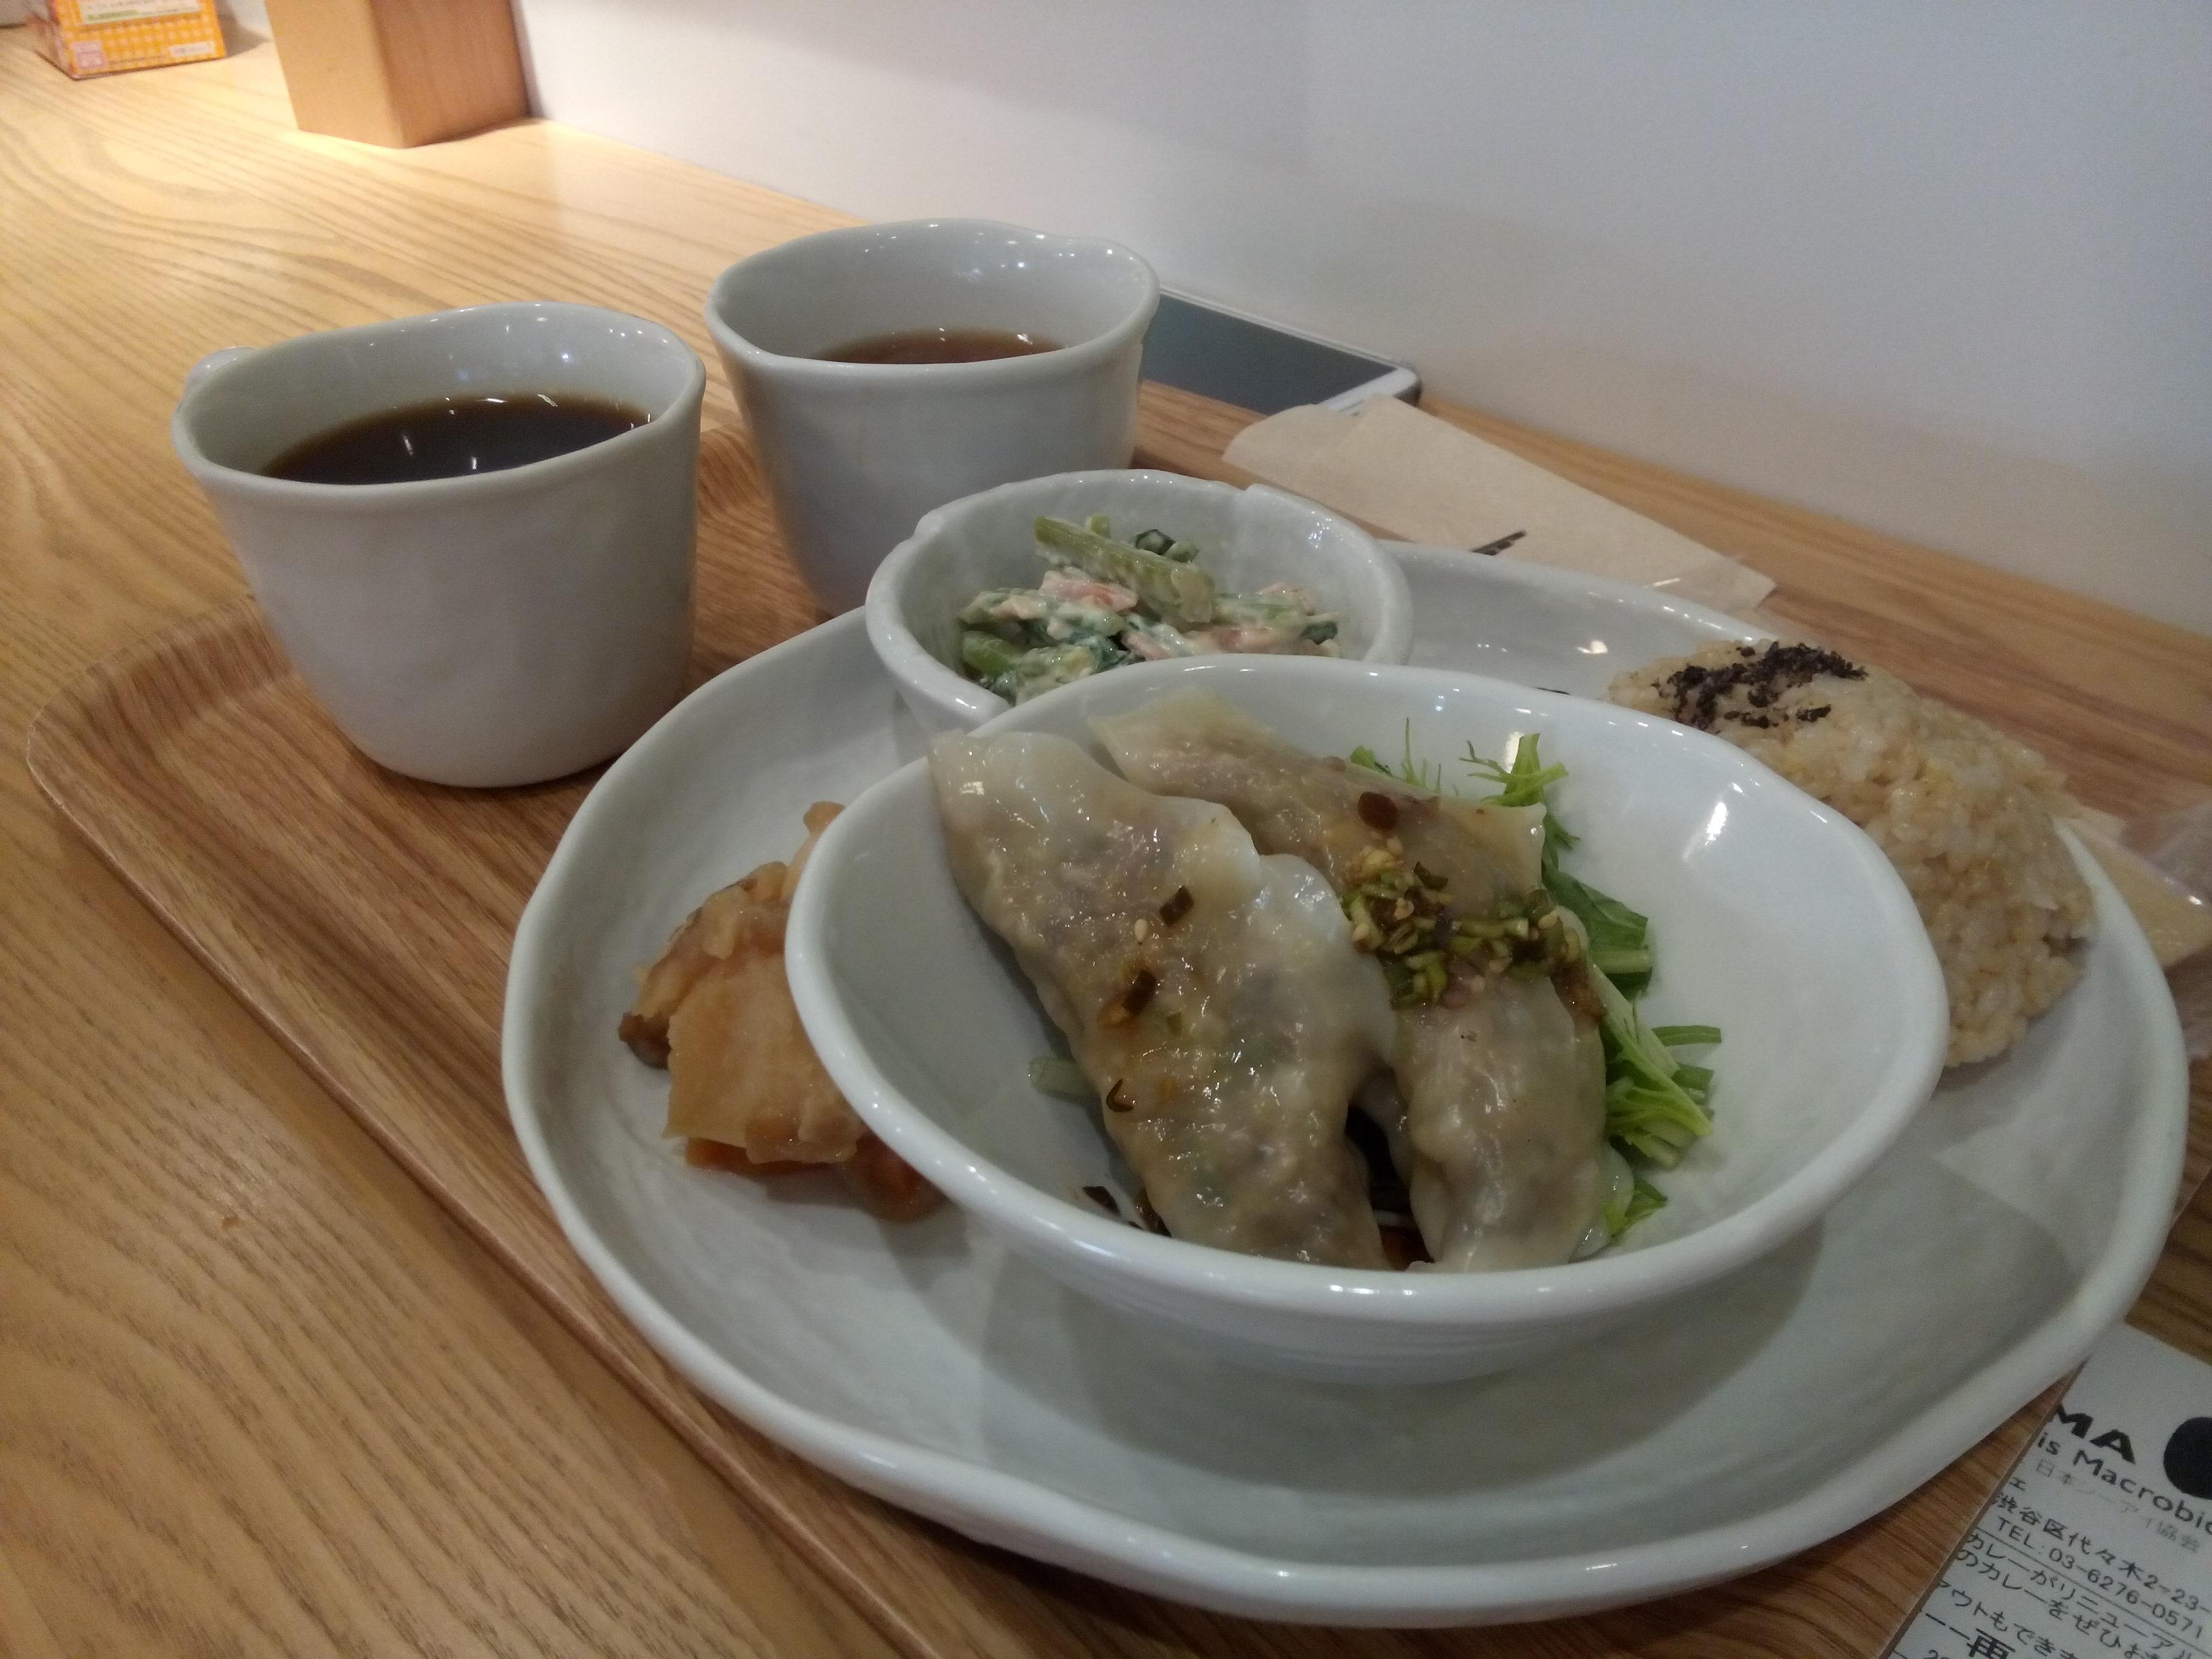 Veggie plate with gyoza